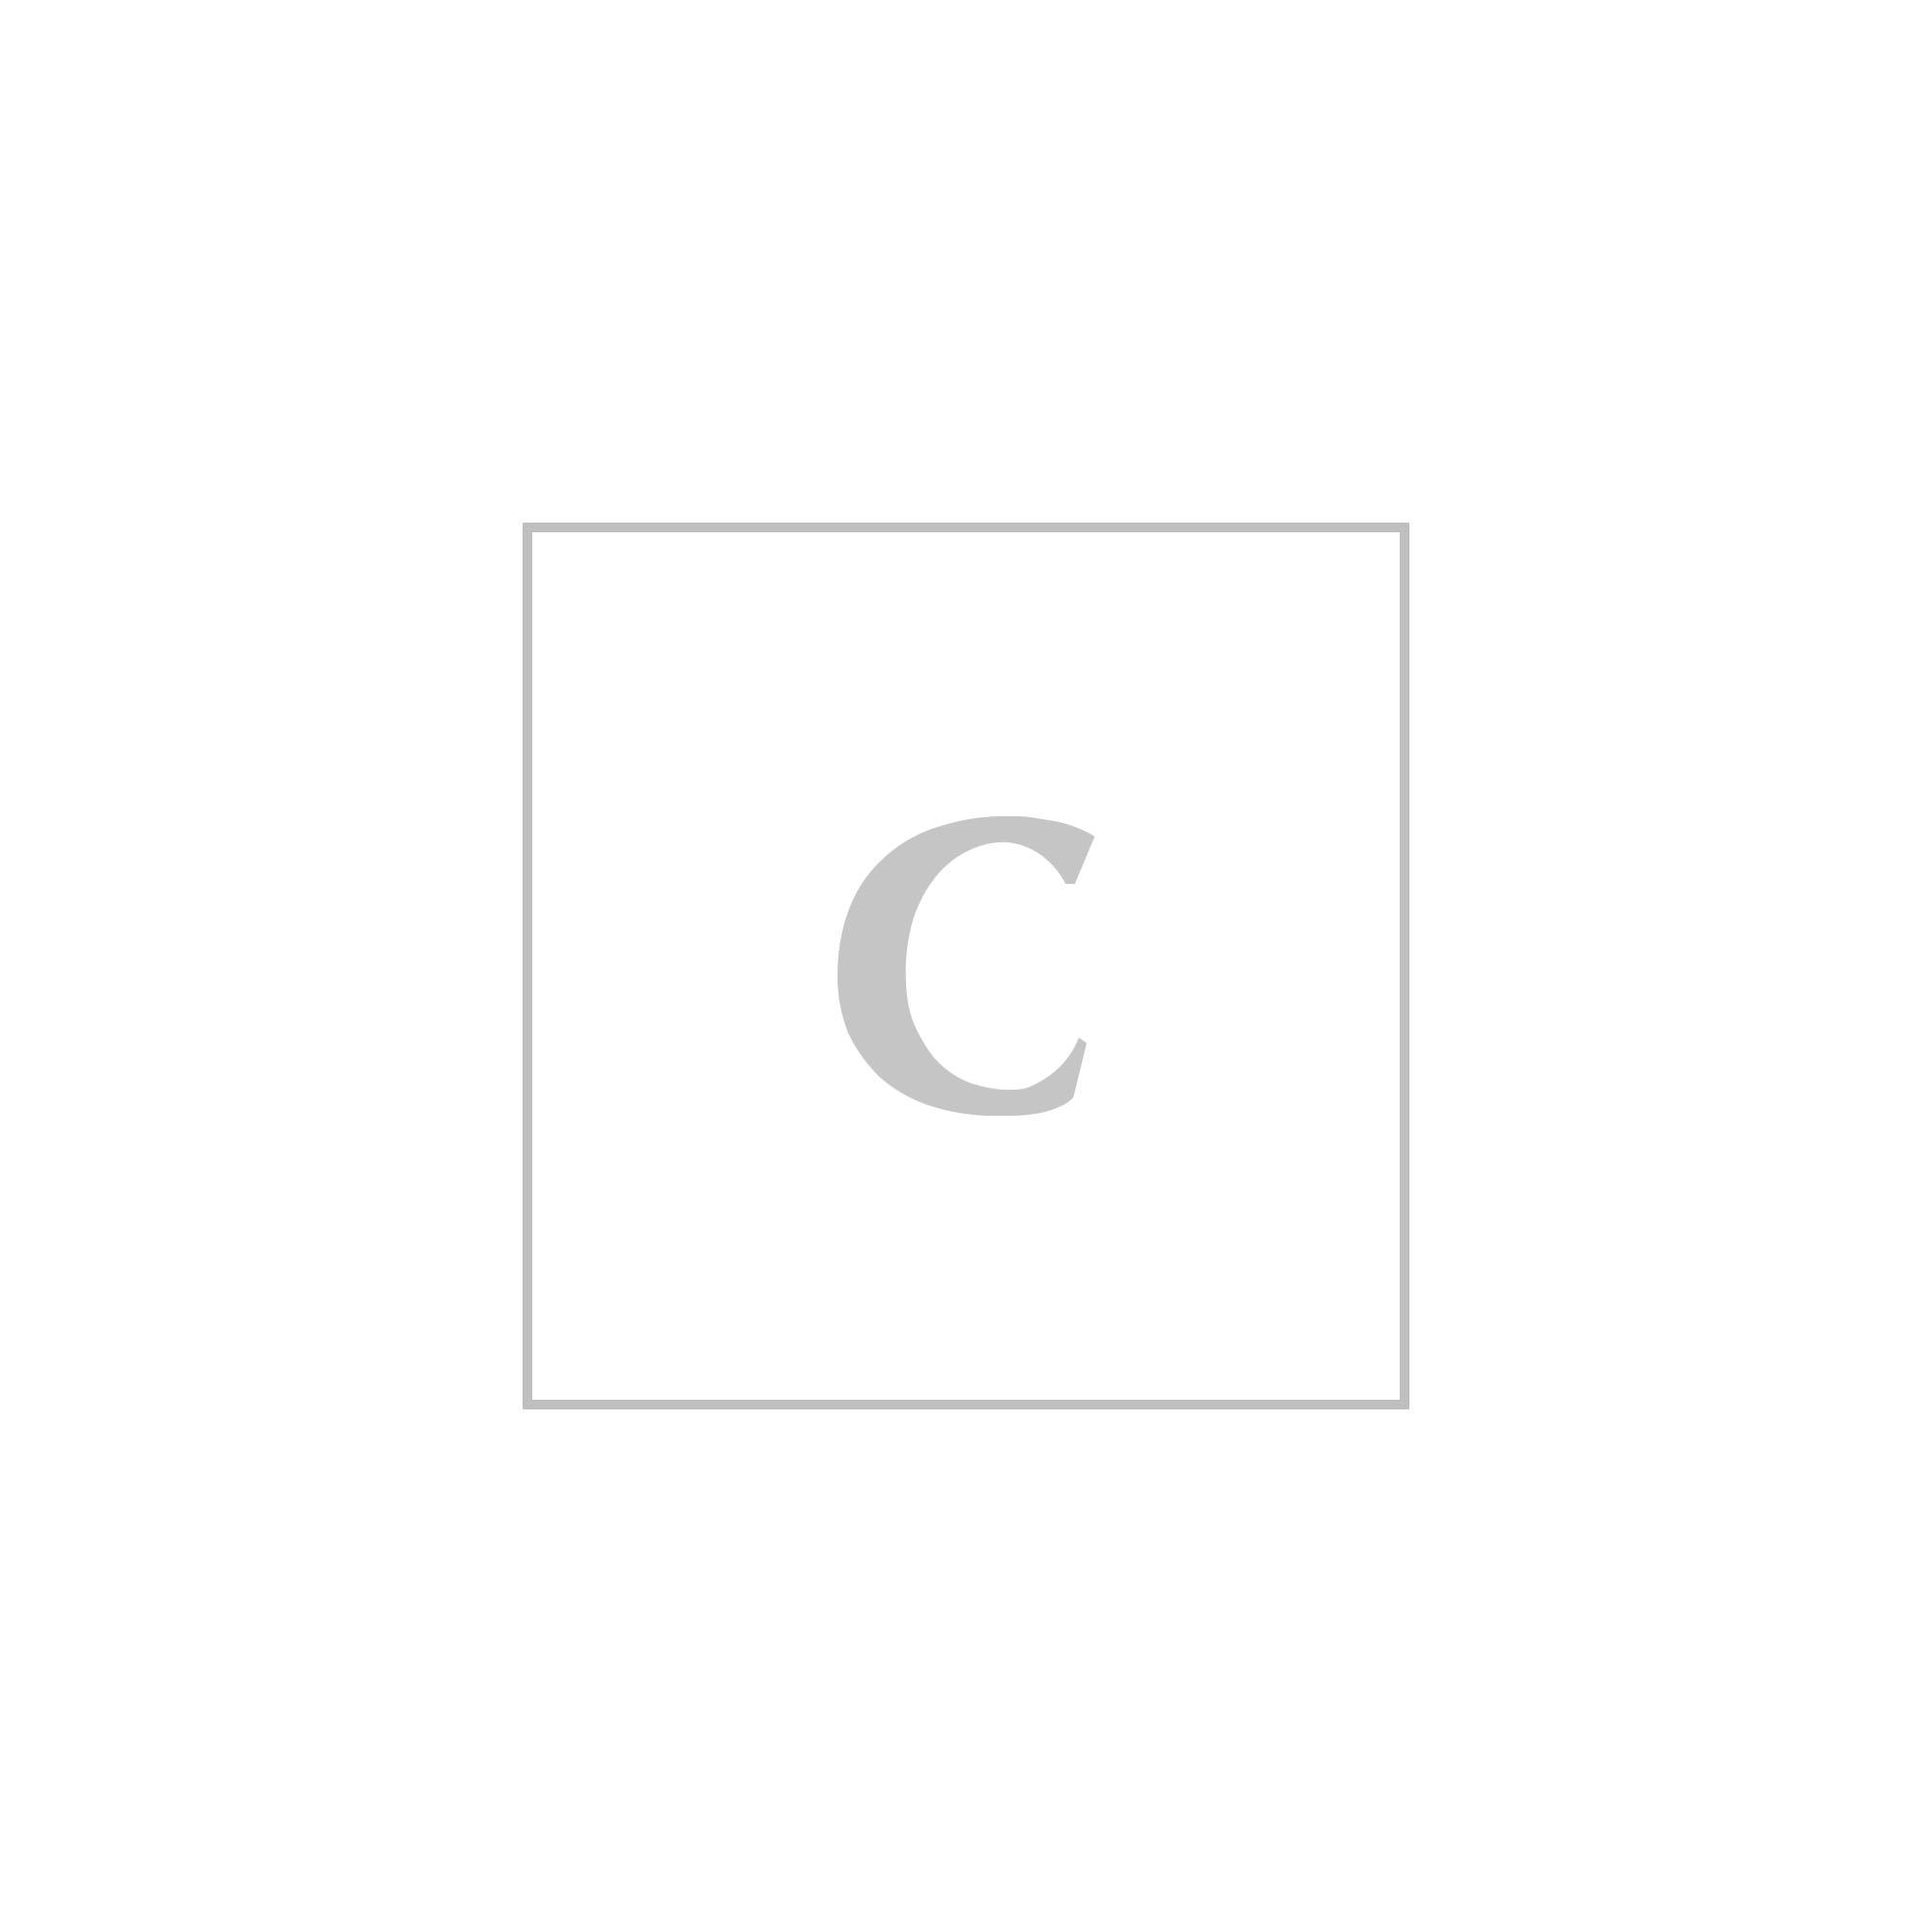 Dolce & gabbana borsa messenger canvas st+cot.+cer+ca